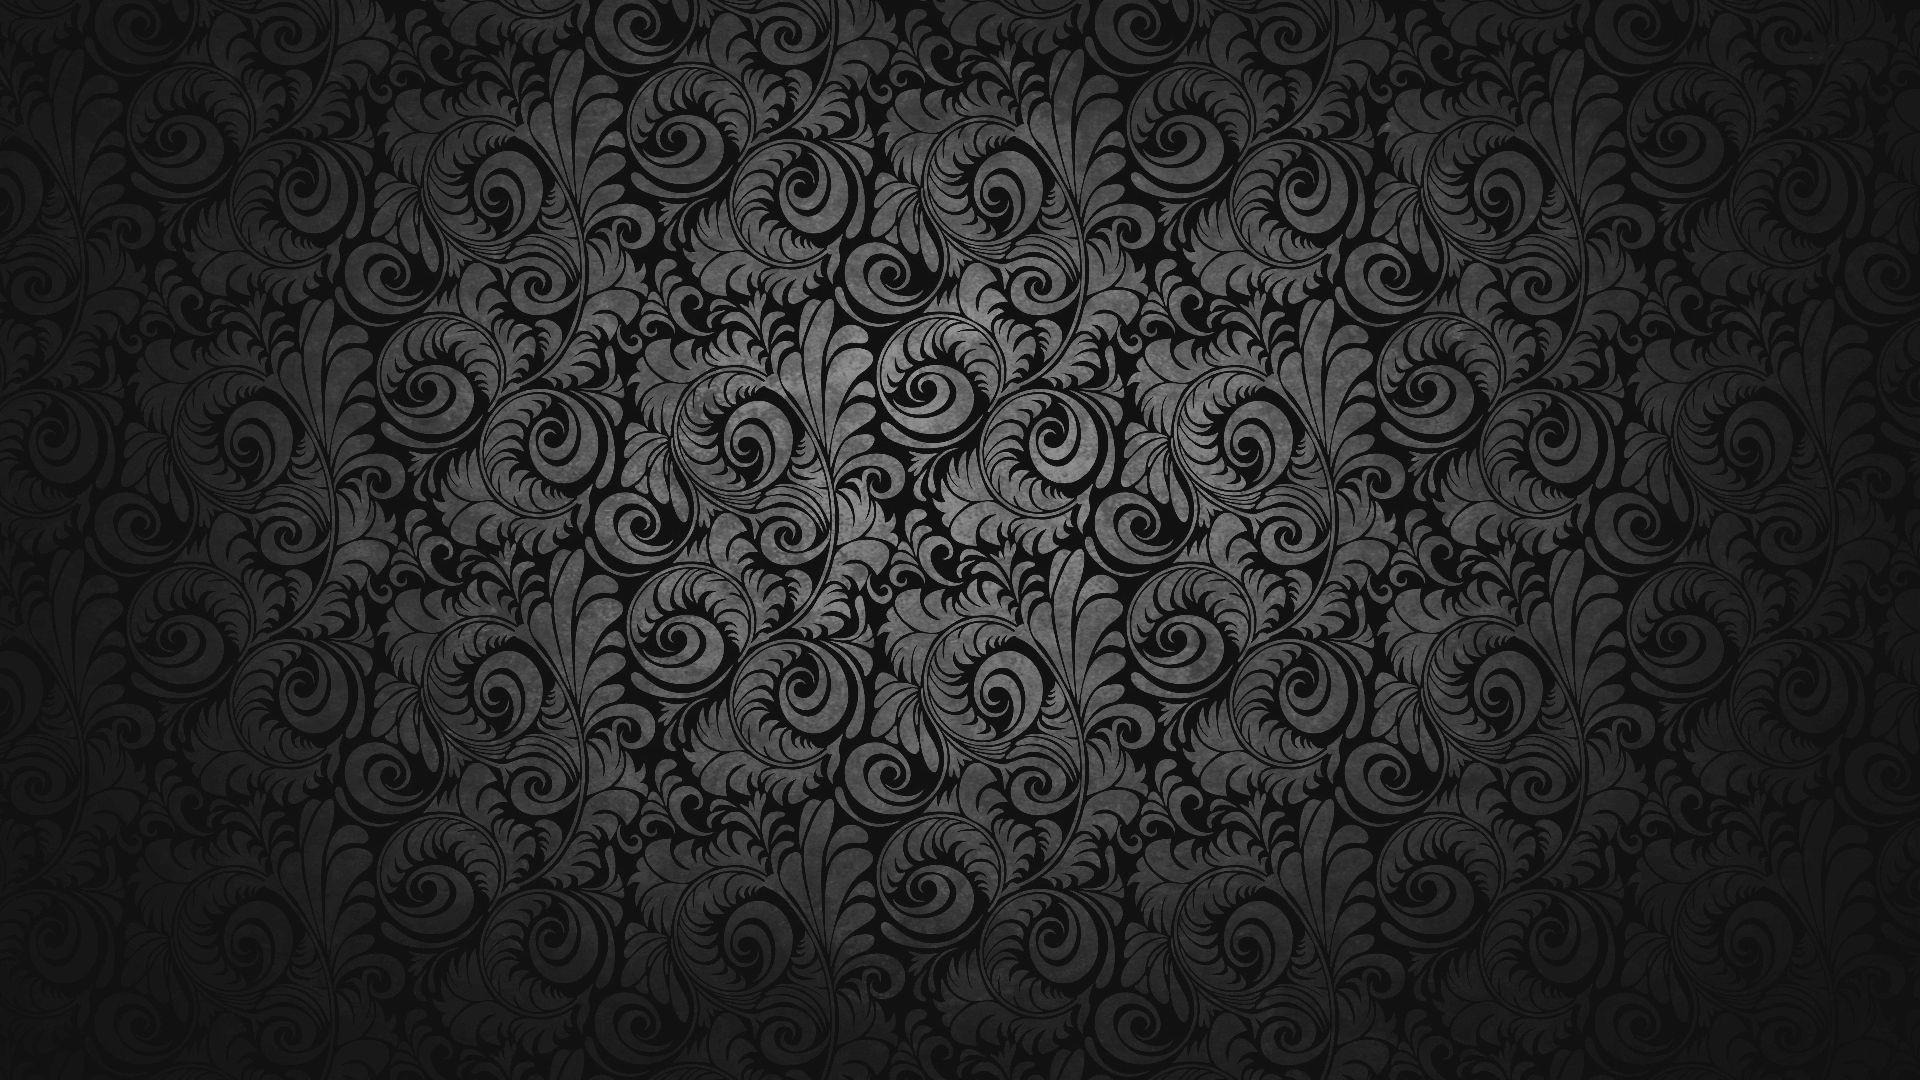 1920x1080 Wallpaper A Paisley HD Download